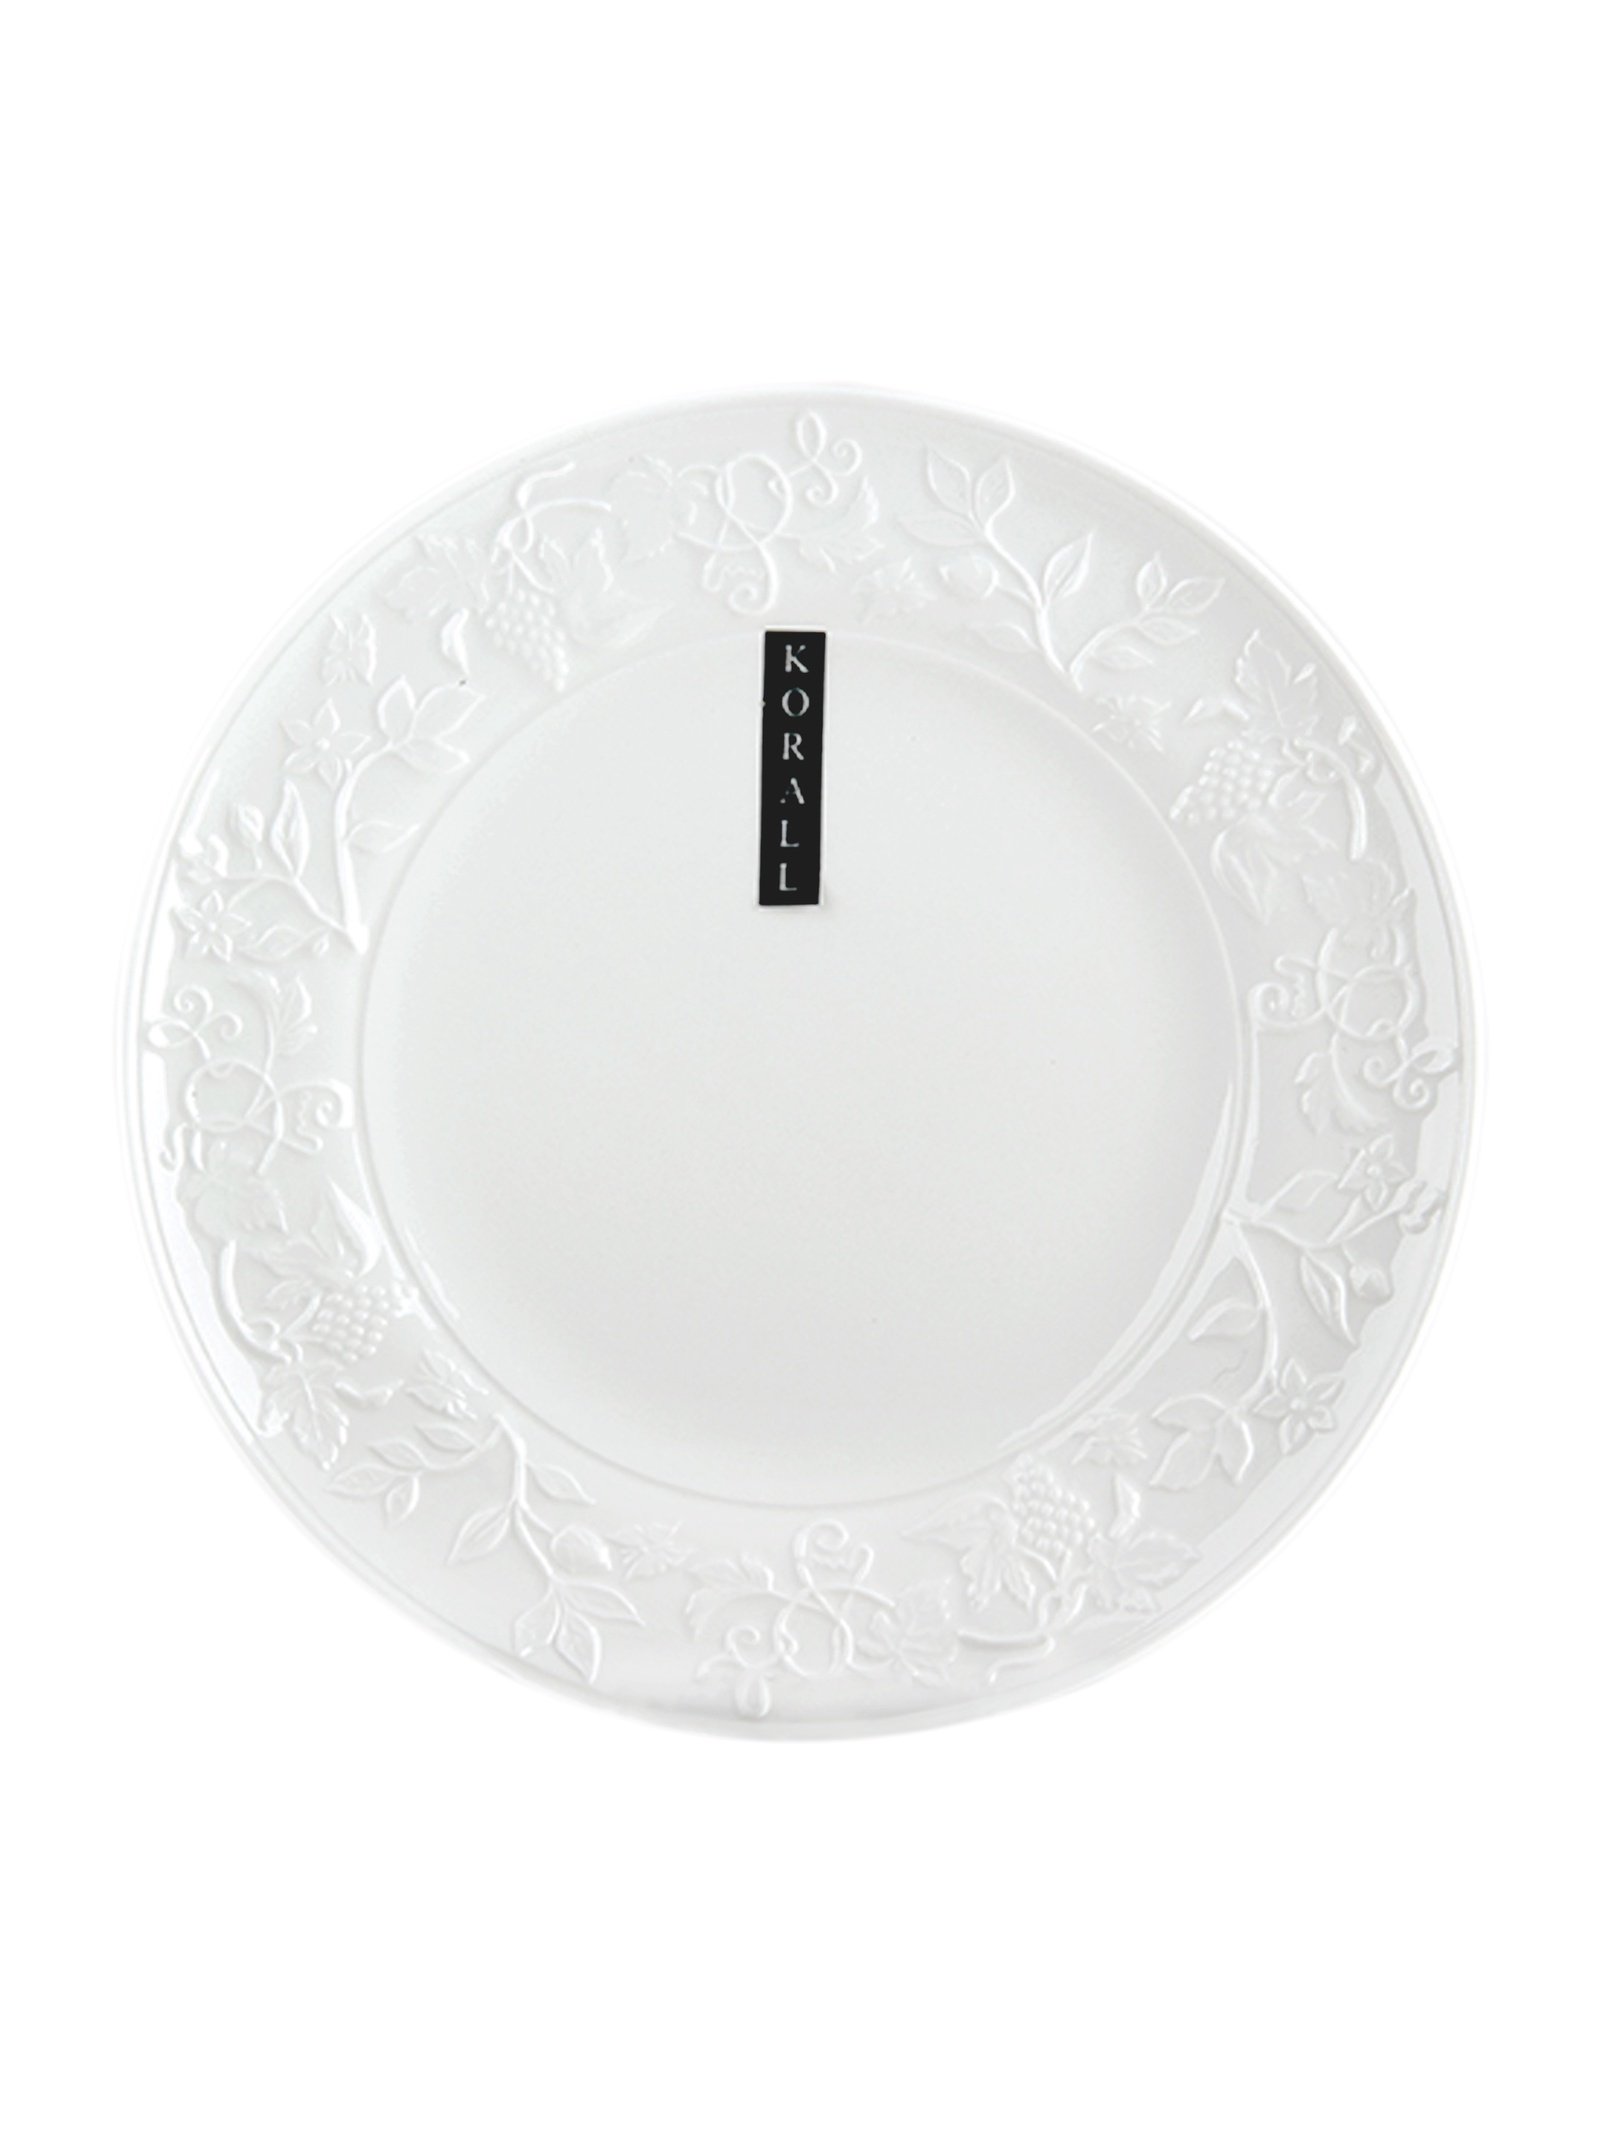 Тарелка десертная Коралл 917198, Керамика тарелка десертная ломоносовская керамика диаметр 21 см